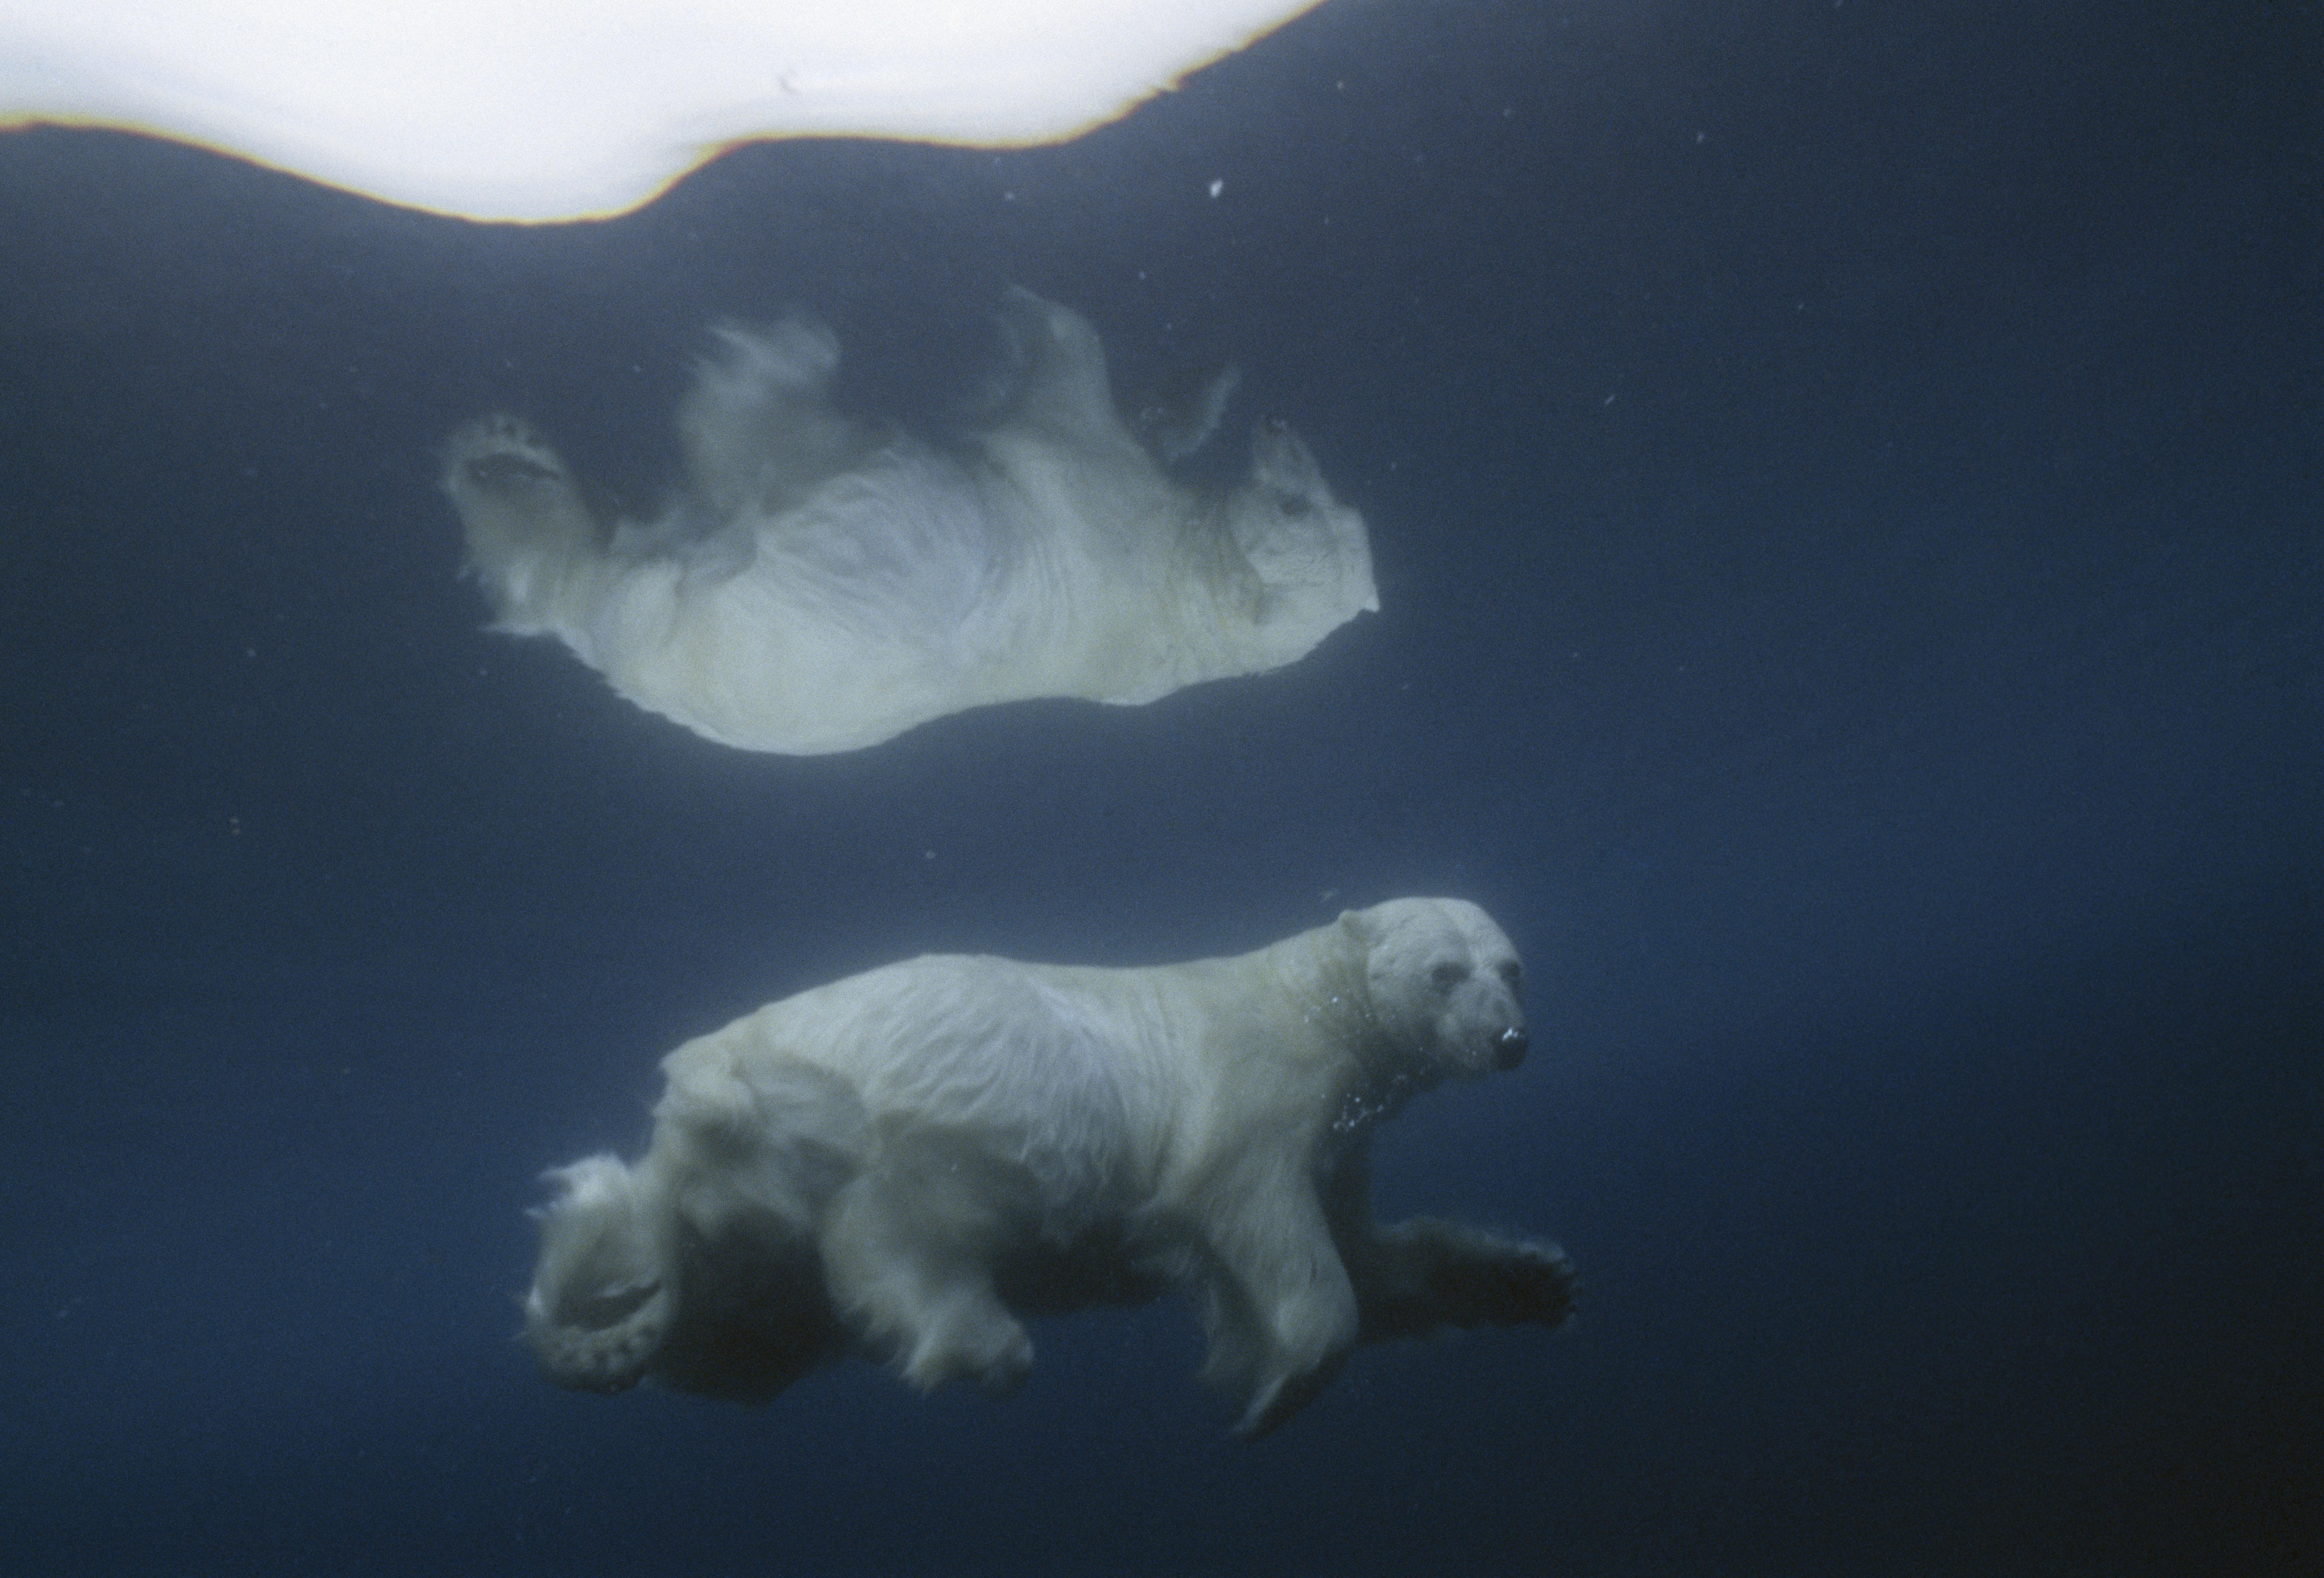 A polar bear swimming beneath an ice floe in Lancaster Sound, Nunavut.